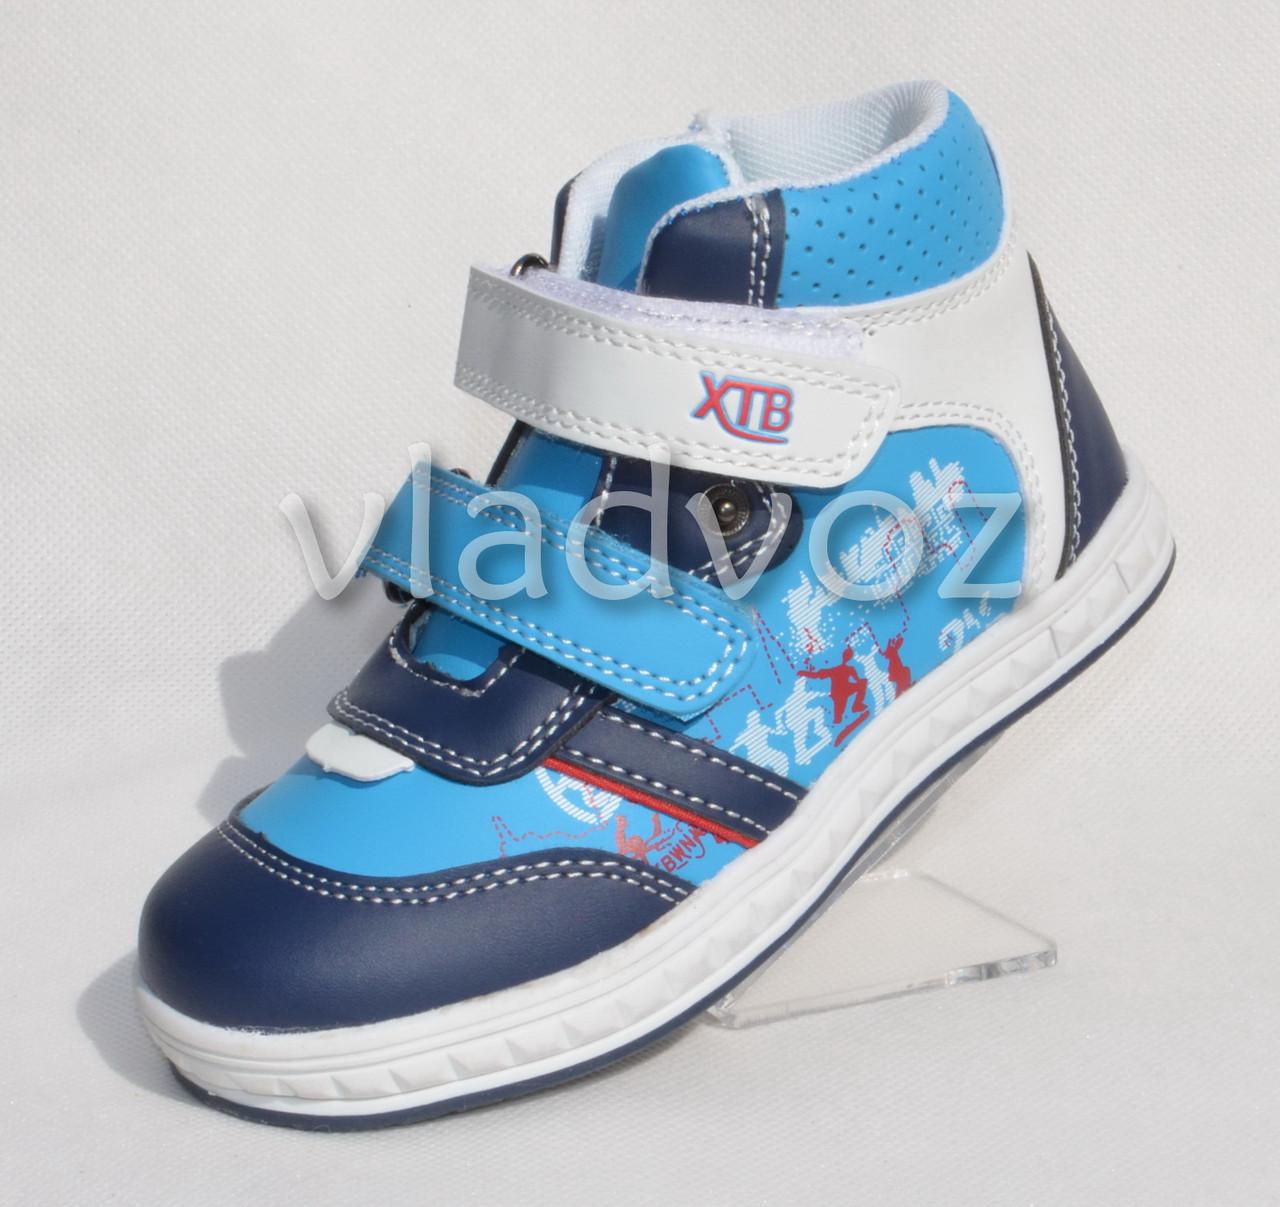 Демисезонные ботинки для мальчика XTB голубой 25р.